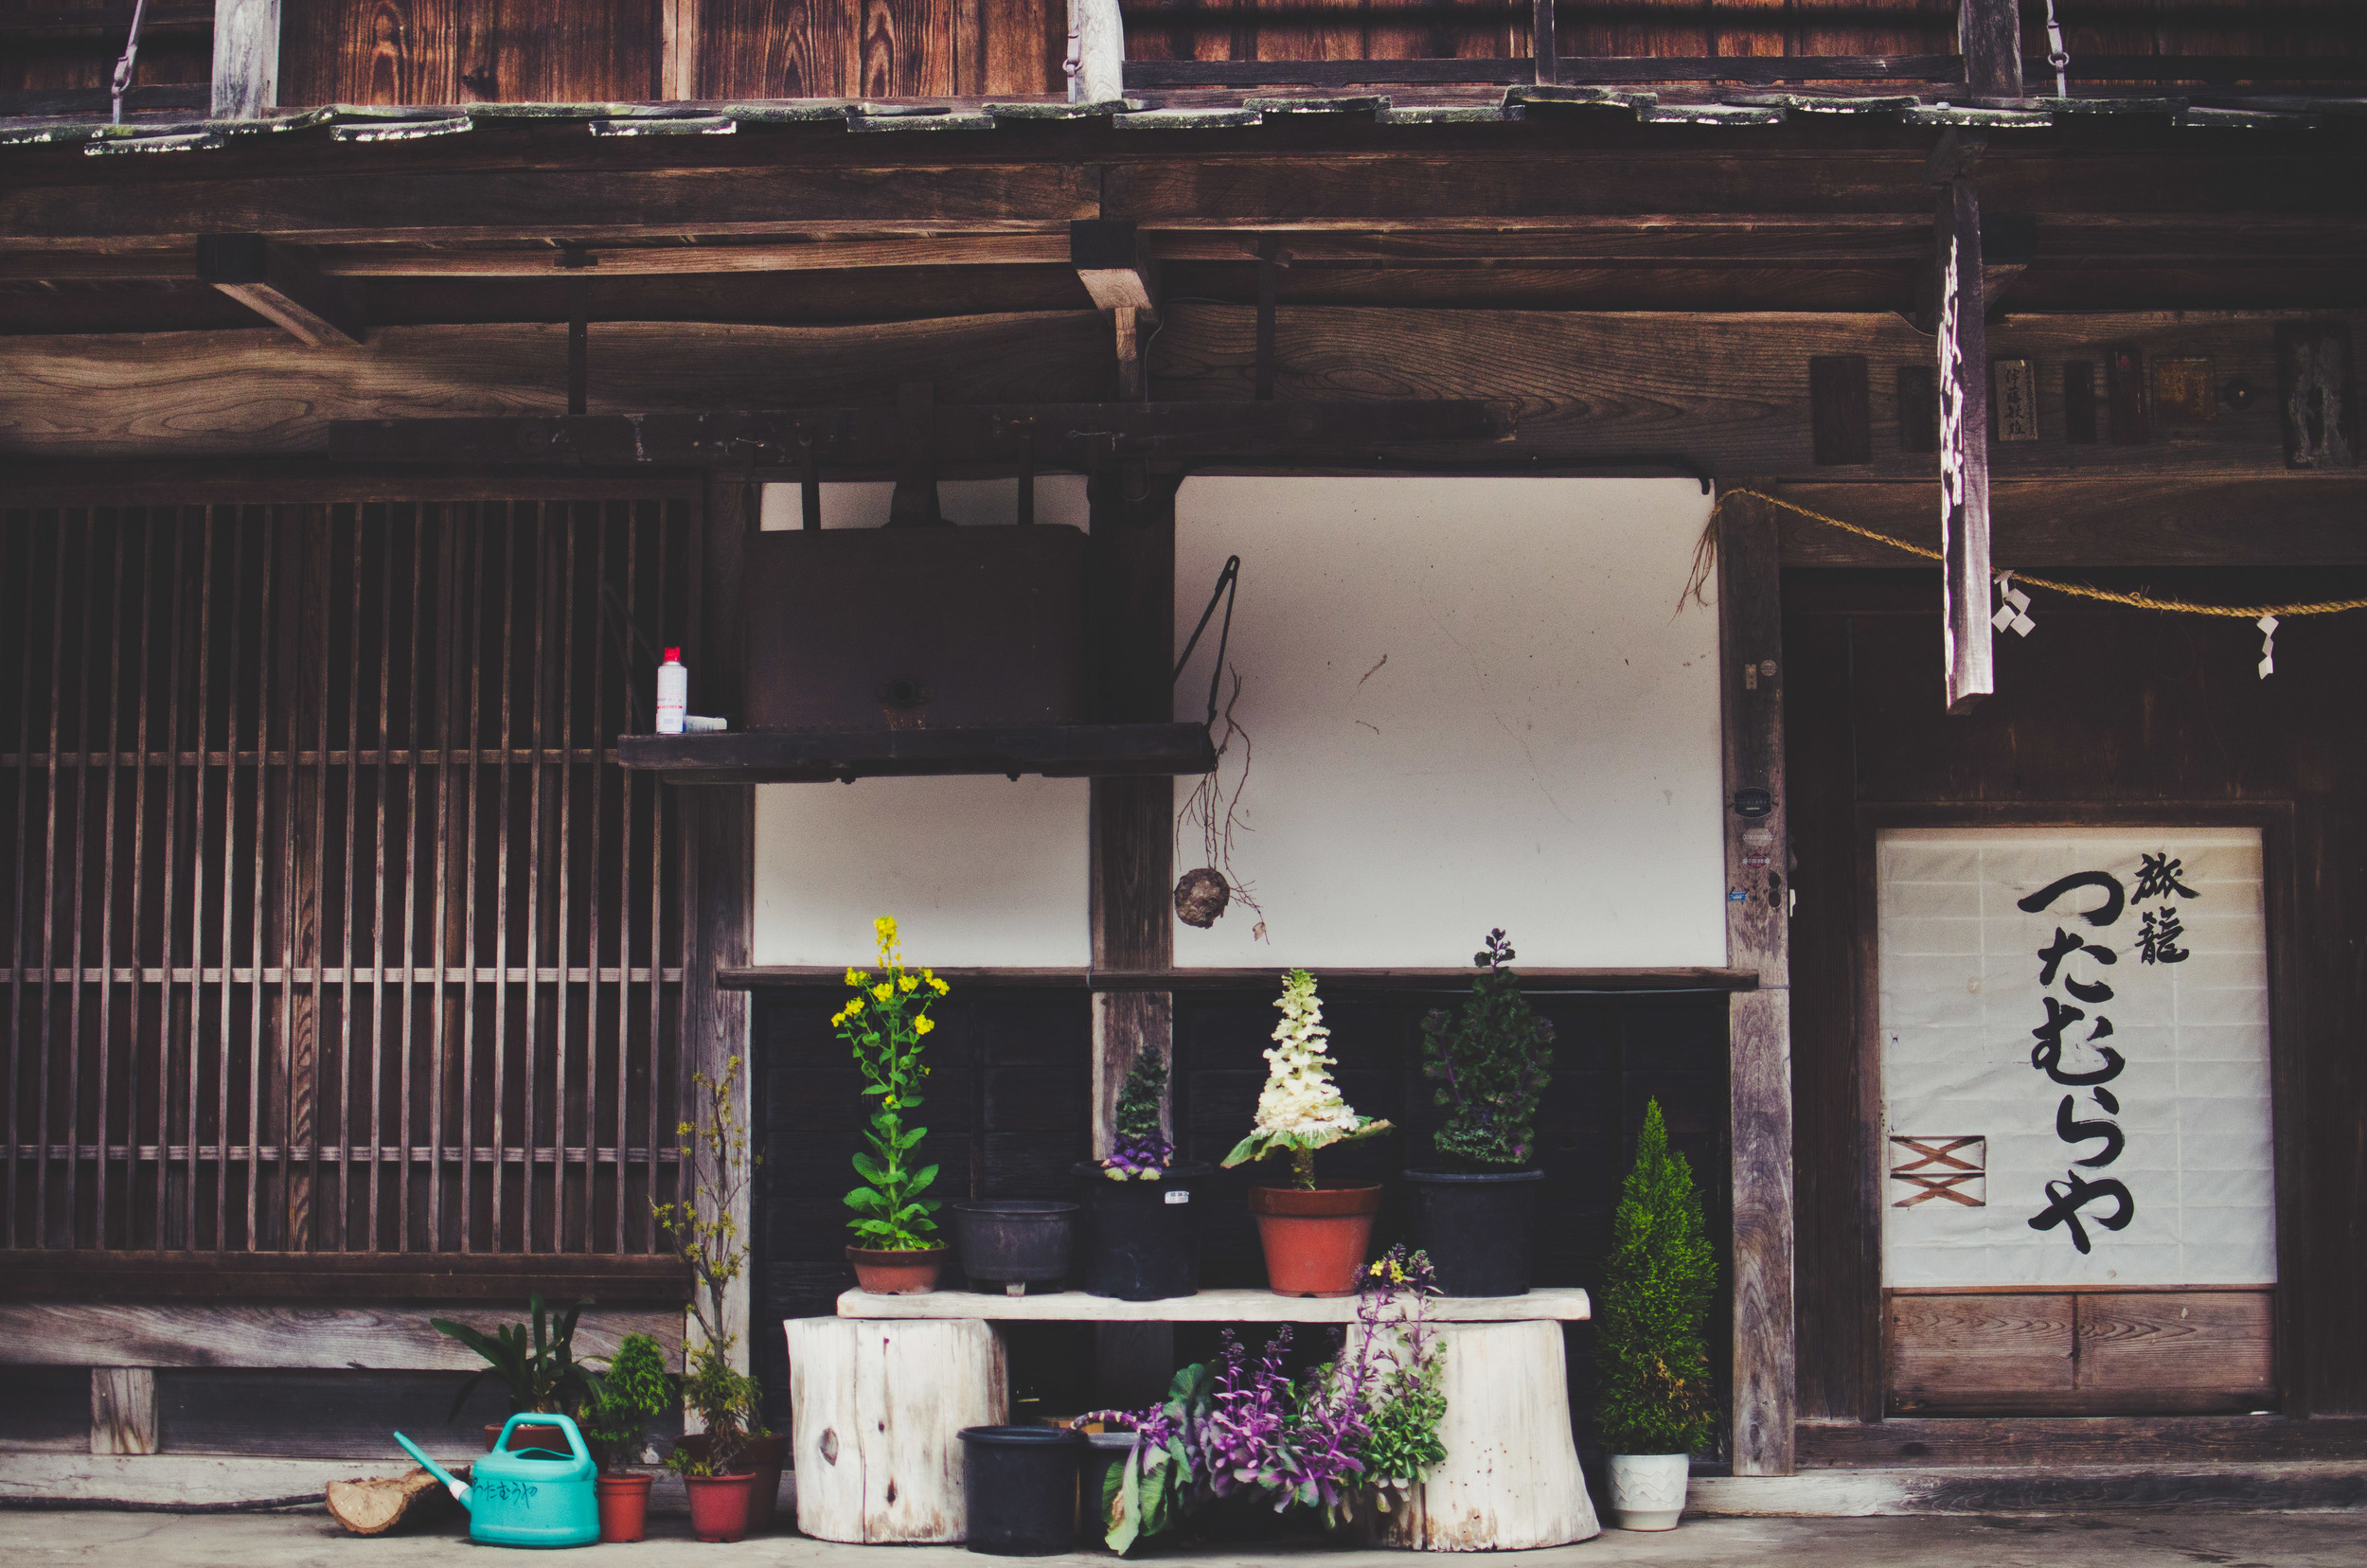 japanblog-40.jpg